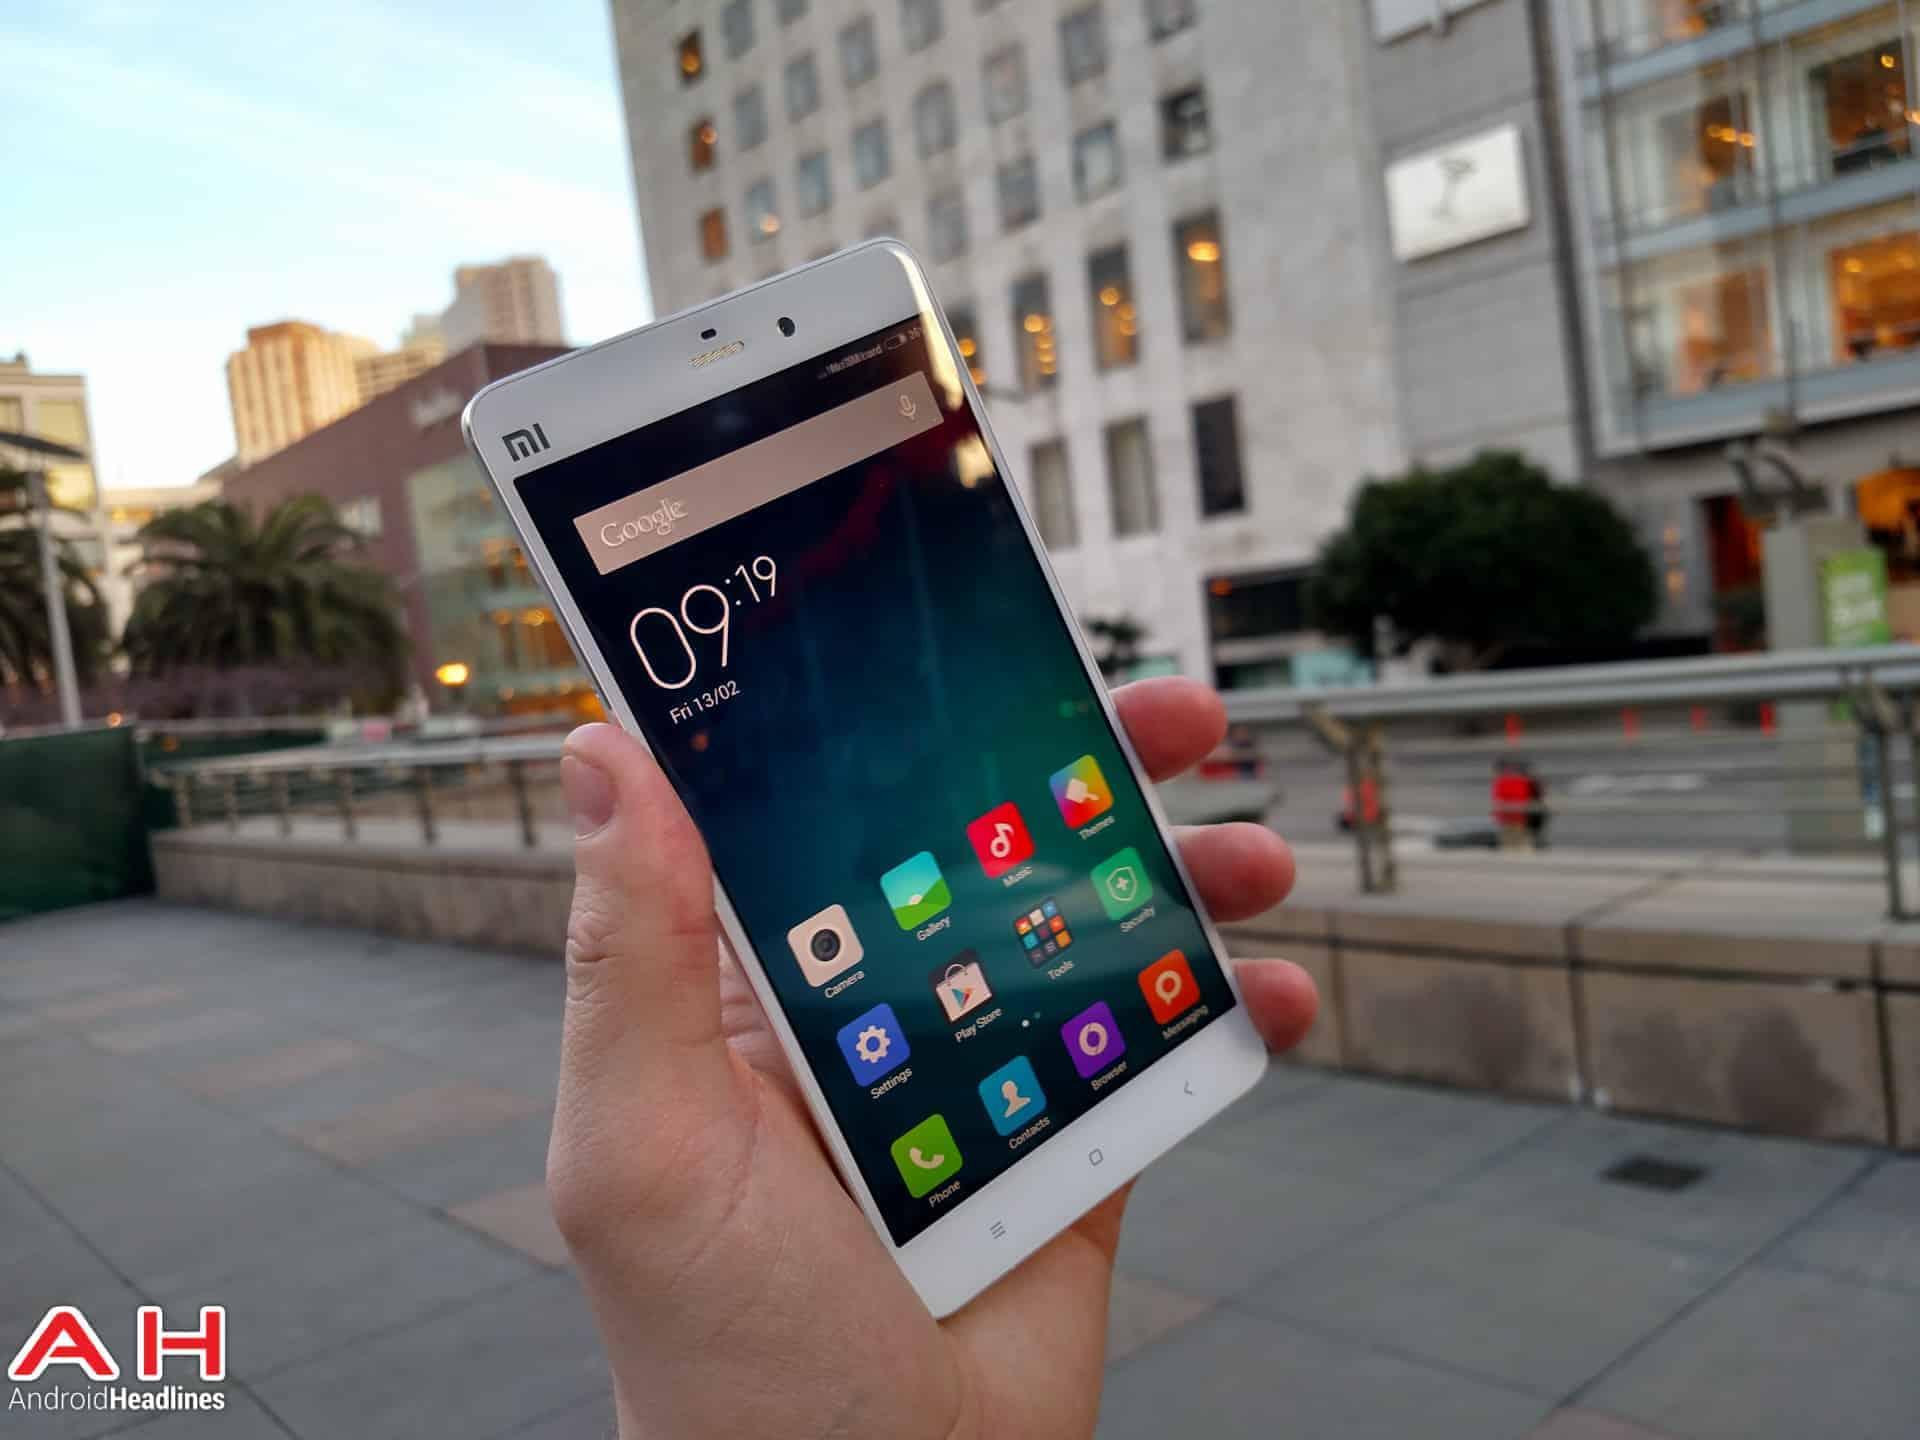 Xiaomi Mi Note AH 2